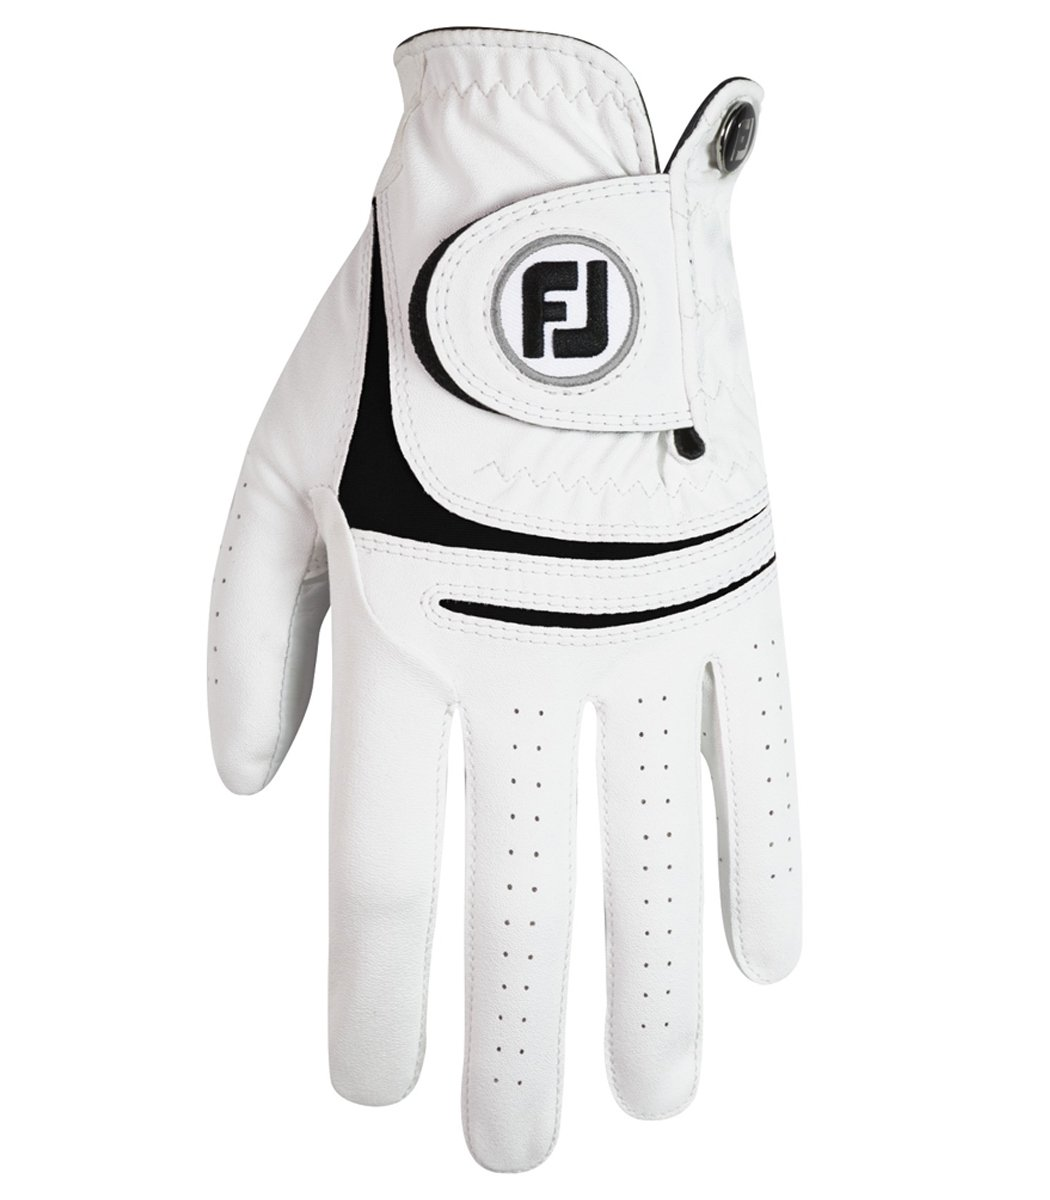 FootJoy WeatherSofゴルフグローブホワイトLeft HandメンズCadetミディアム   B00NIHYCHE